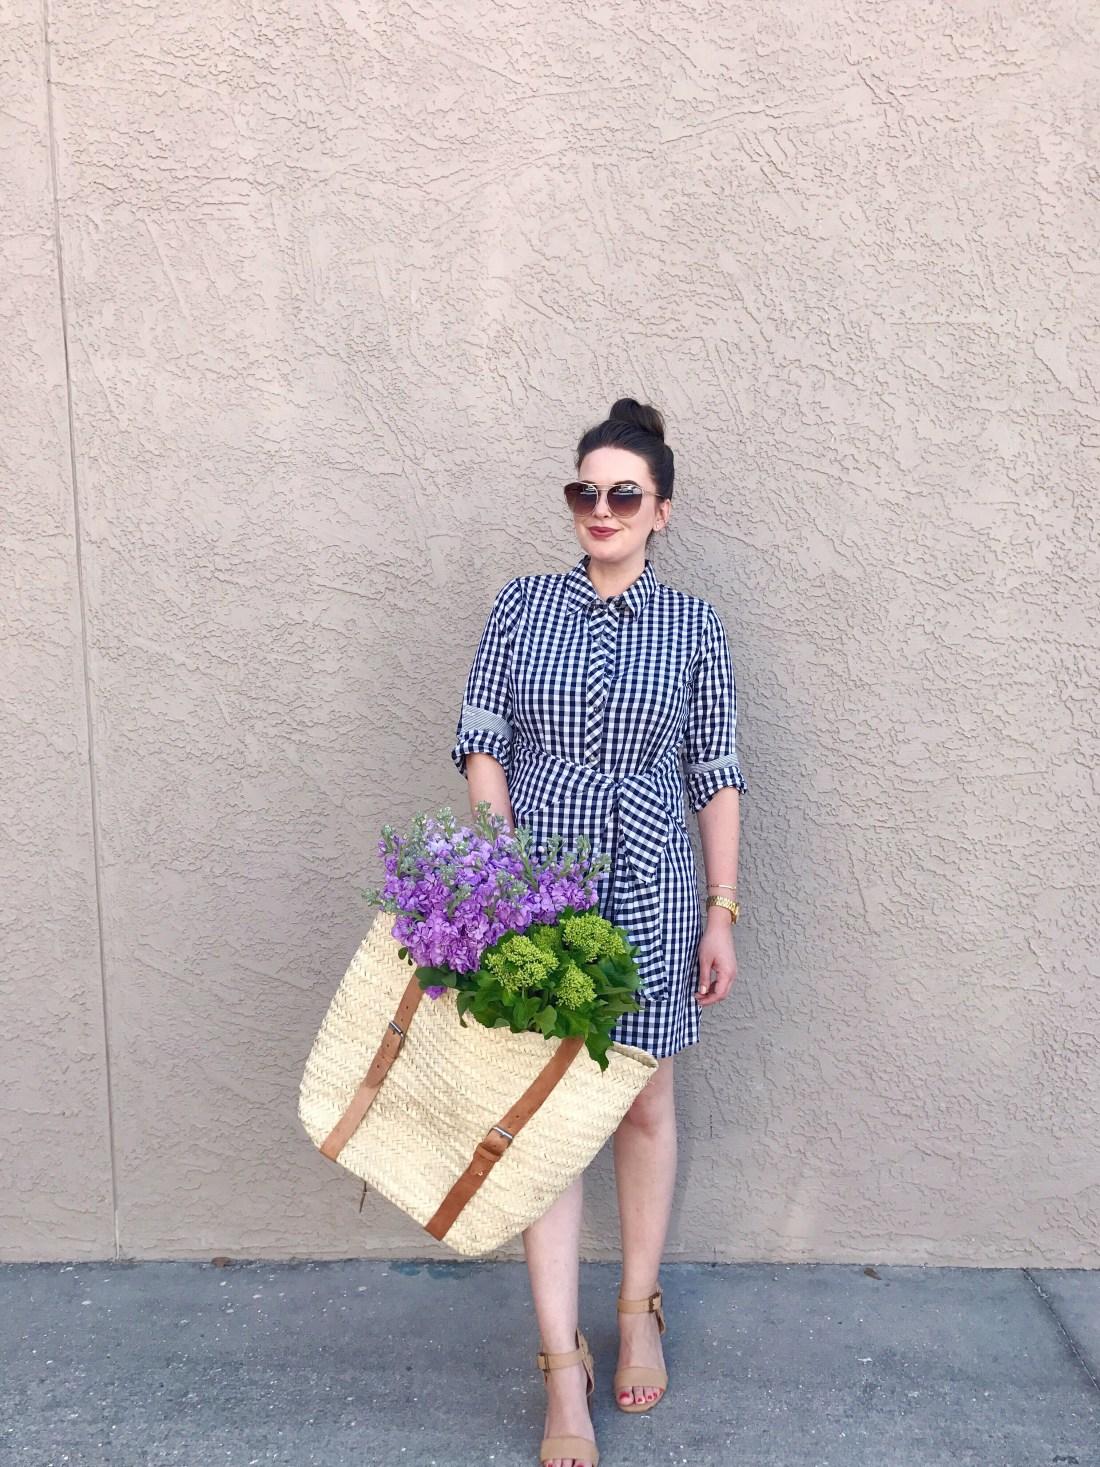 style blog, spring summer style, shirt dress outfit, flowers in handbag, basket bag backpack